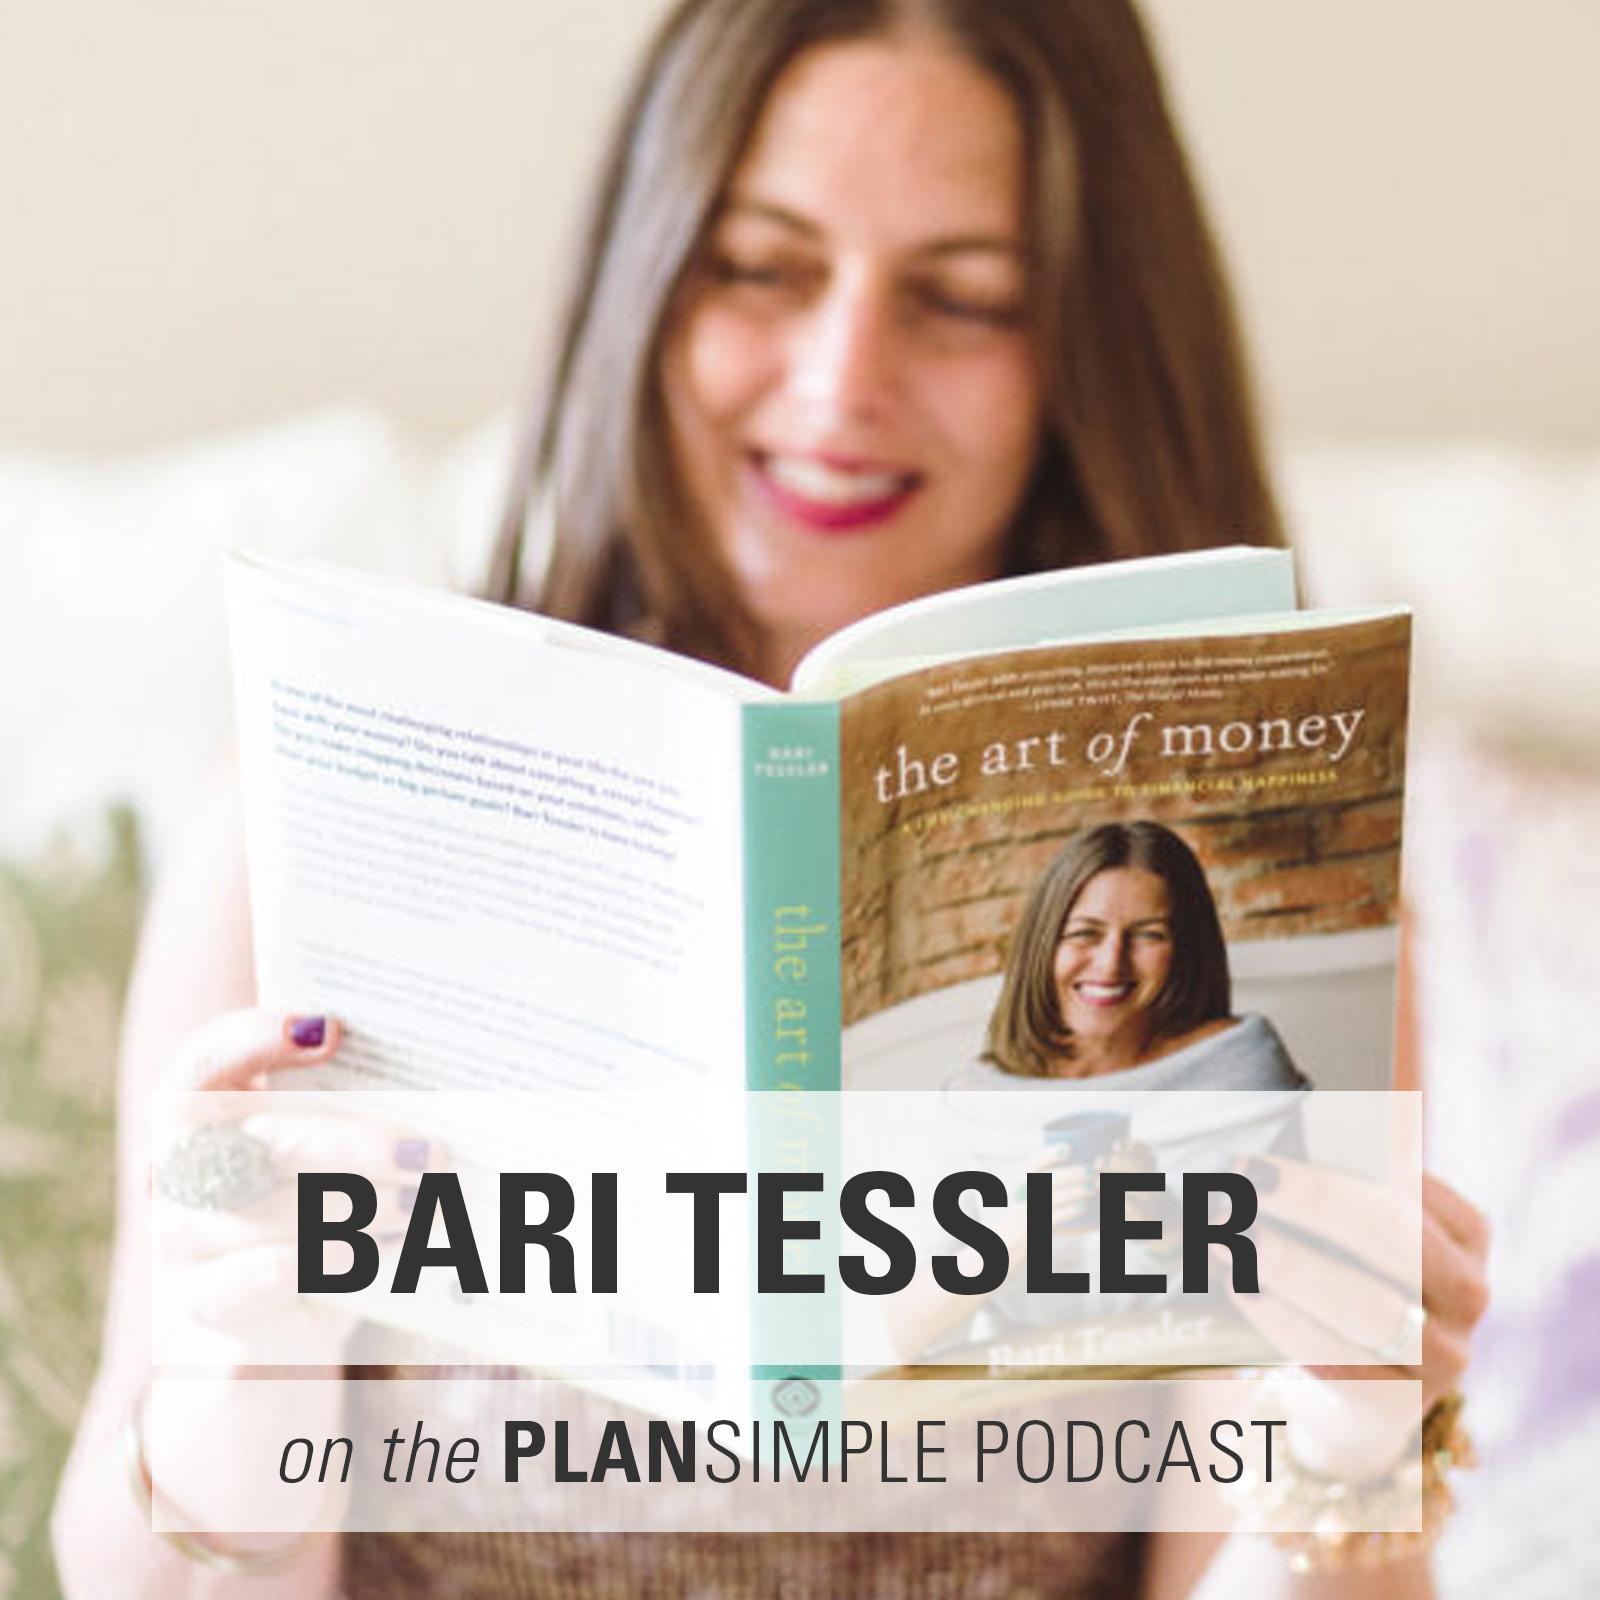 The Art Of Money With Bari Tessler